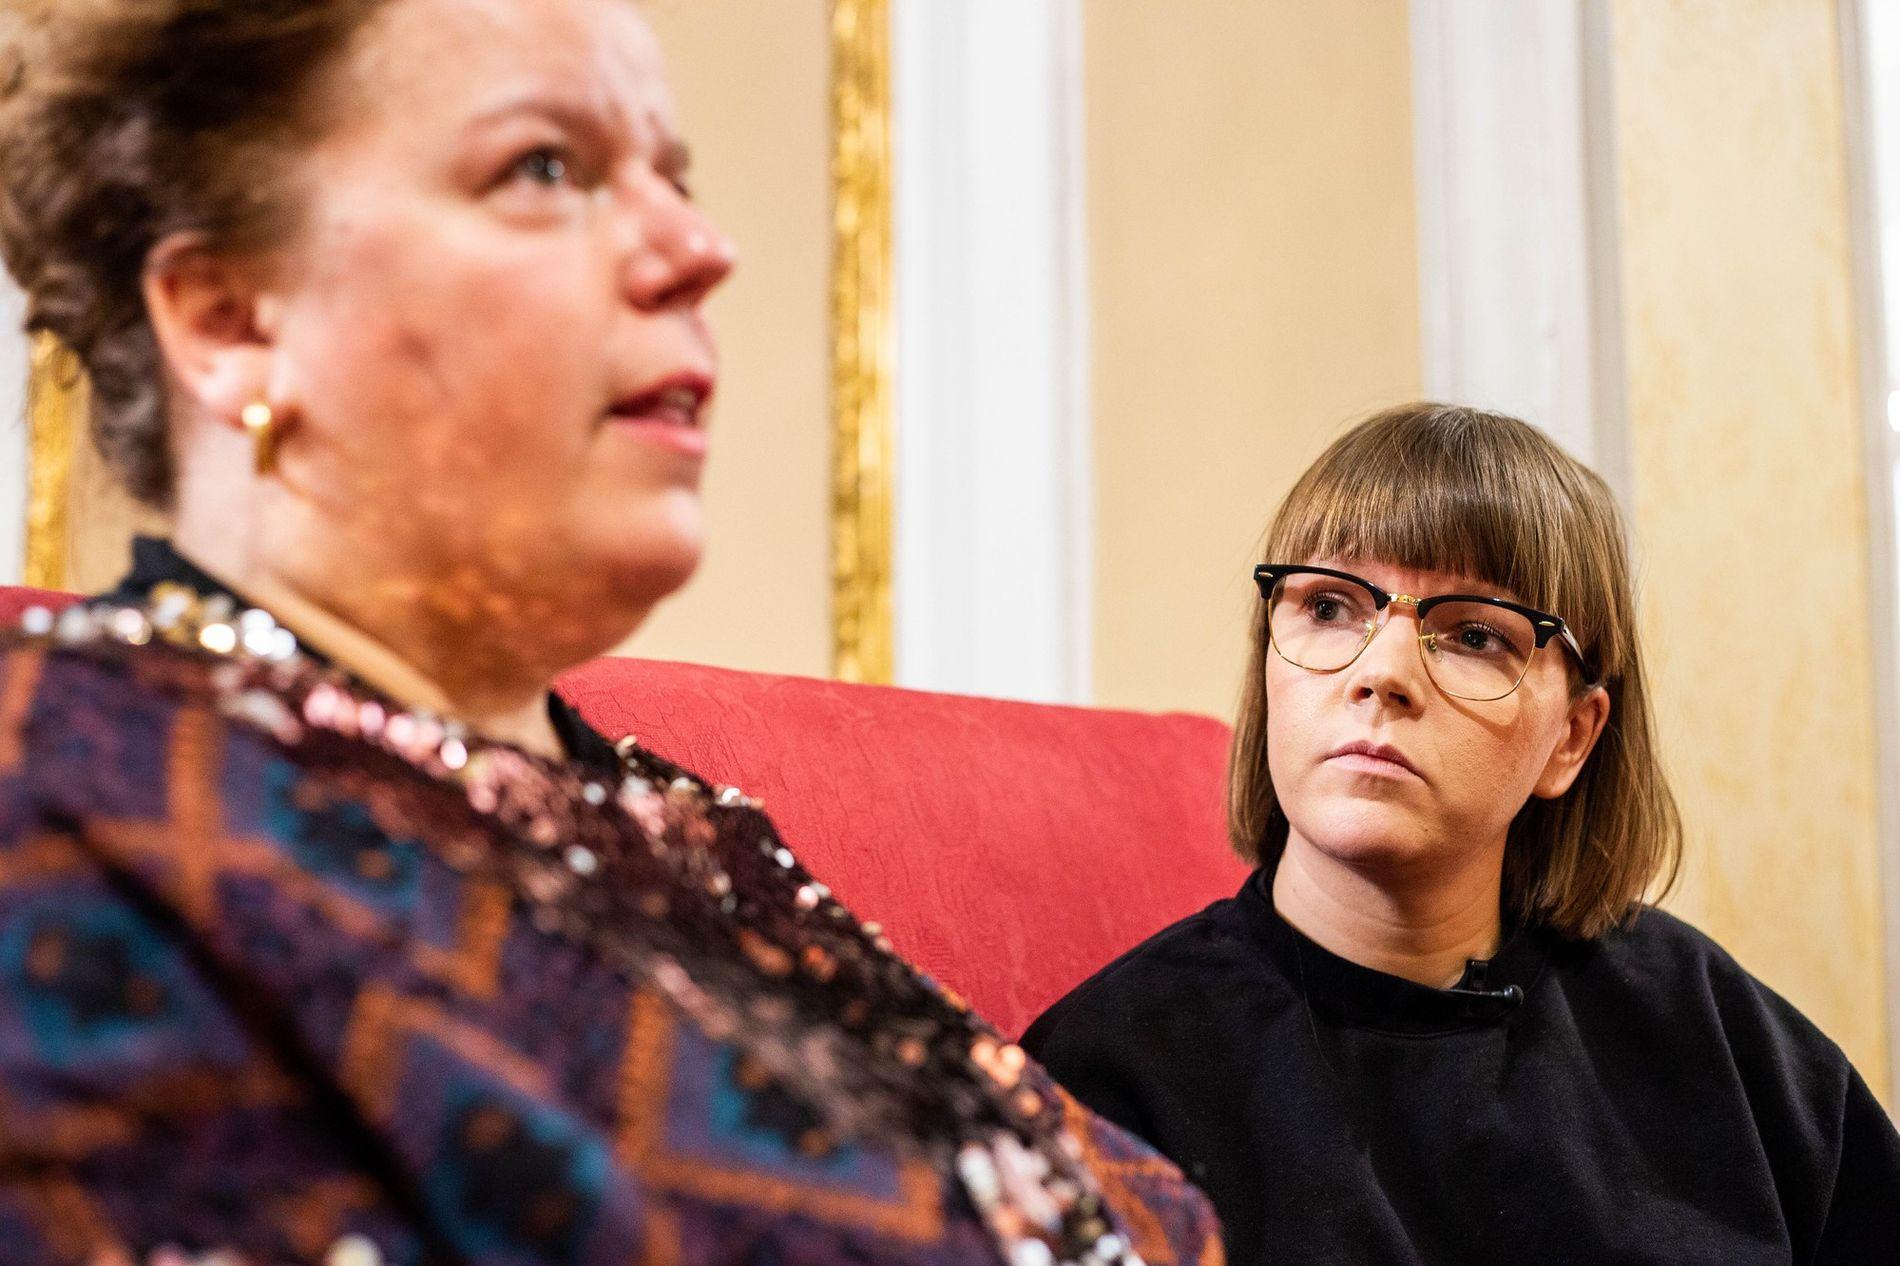 THE KÅSS FURUSETHS: Else og Cecilie Ramona Kåss Furuseth i «Sinnsykt».